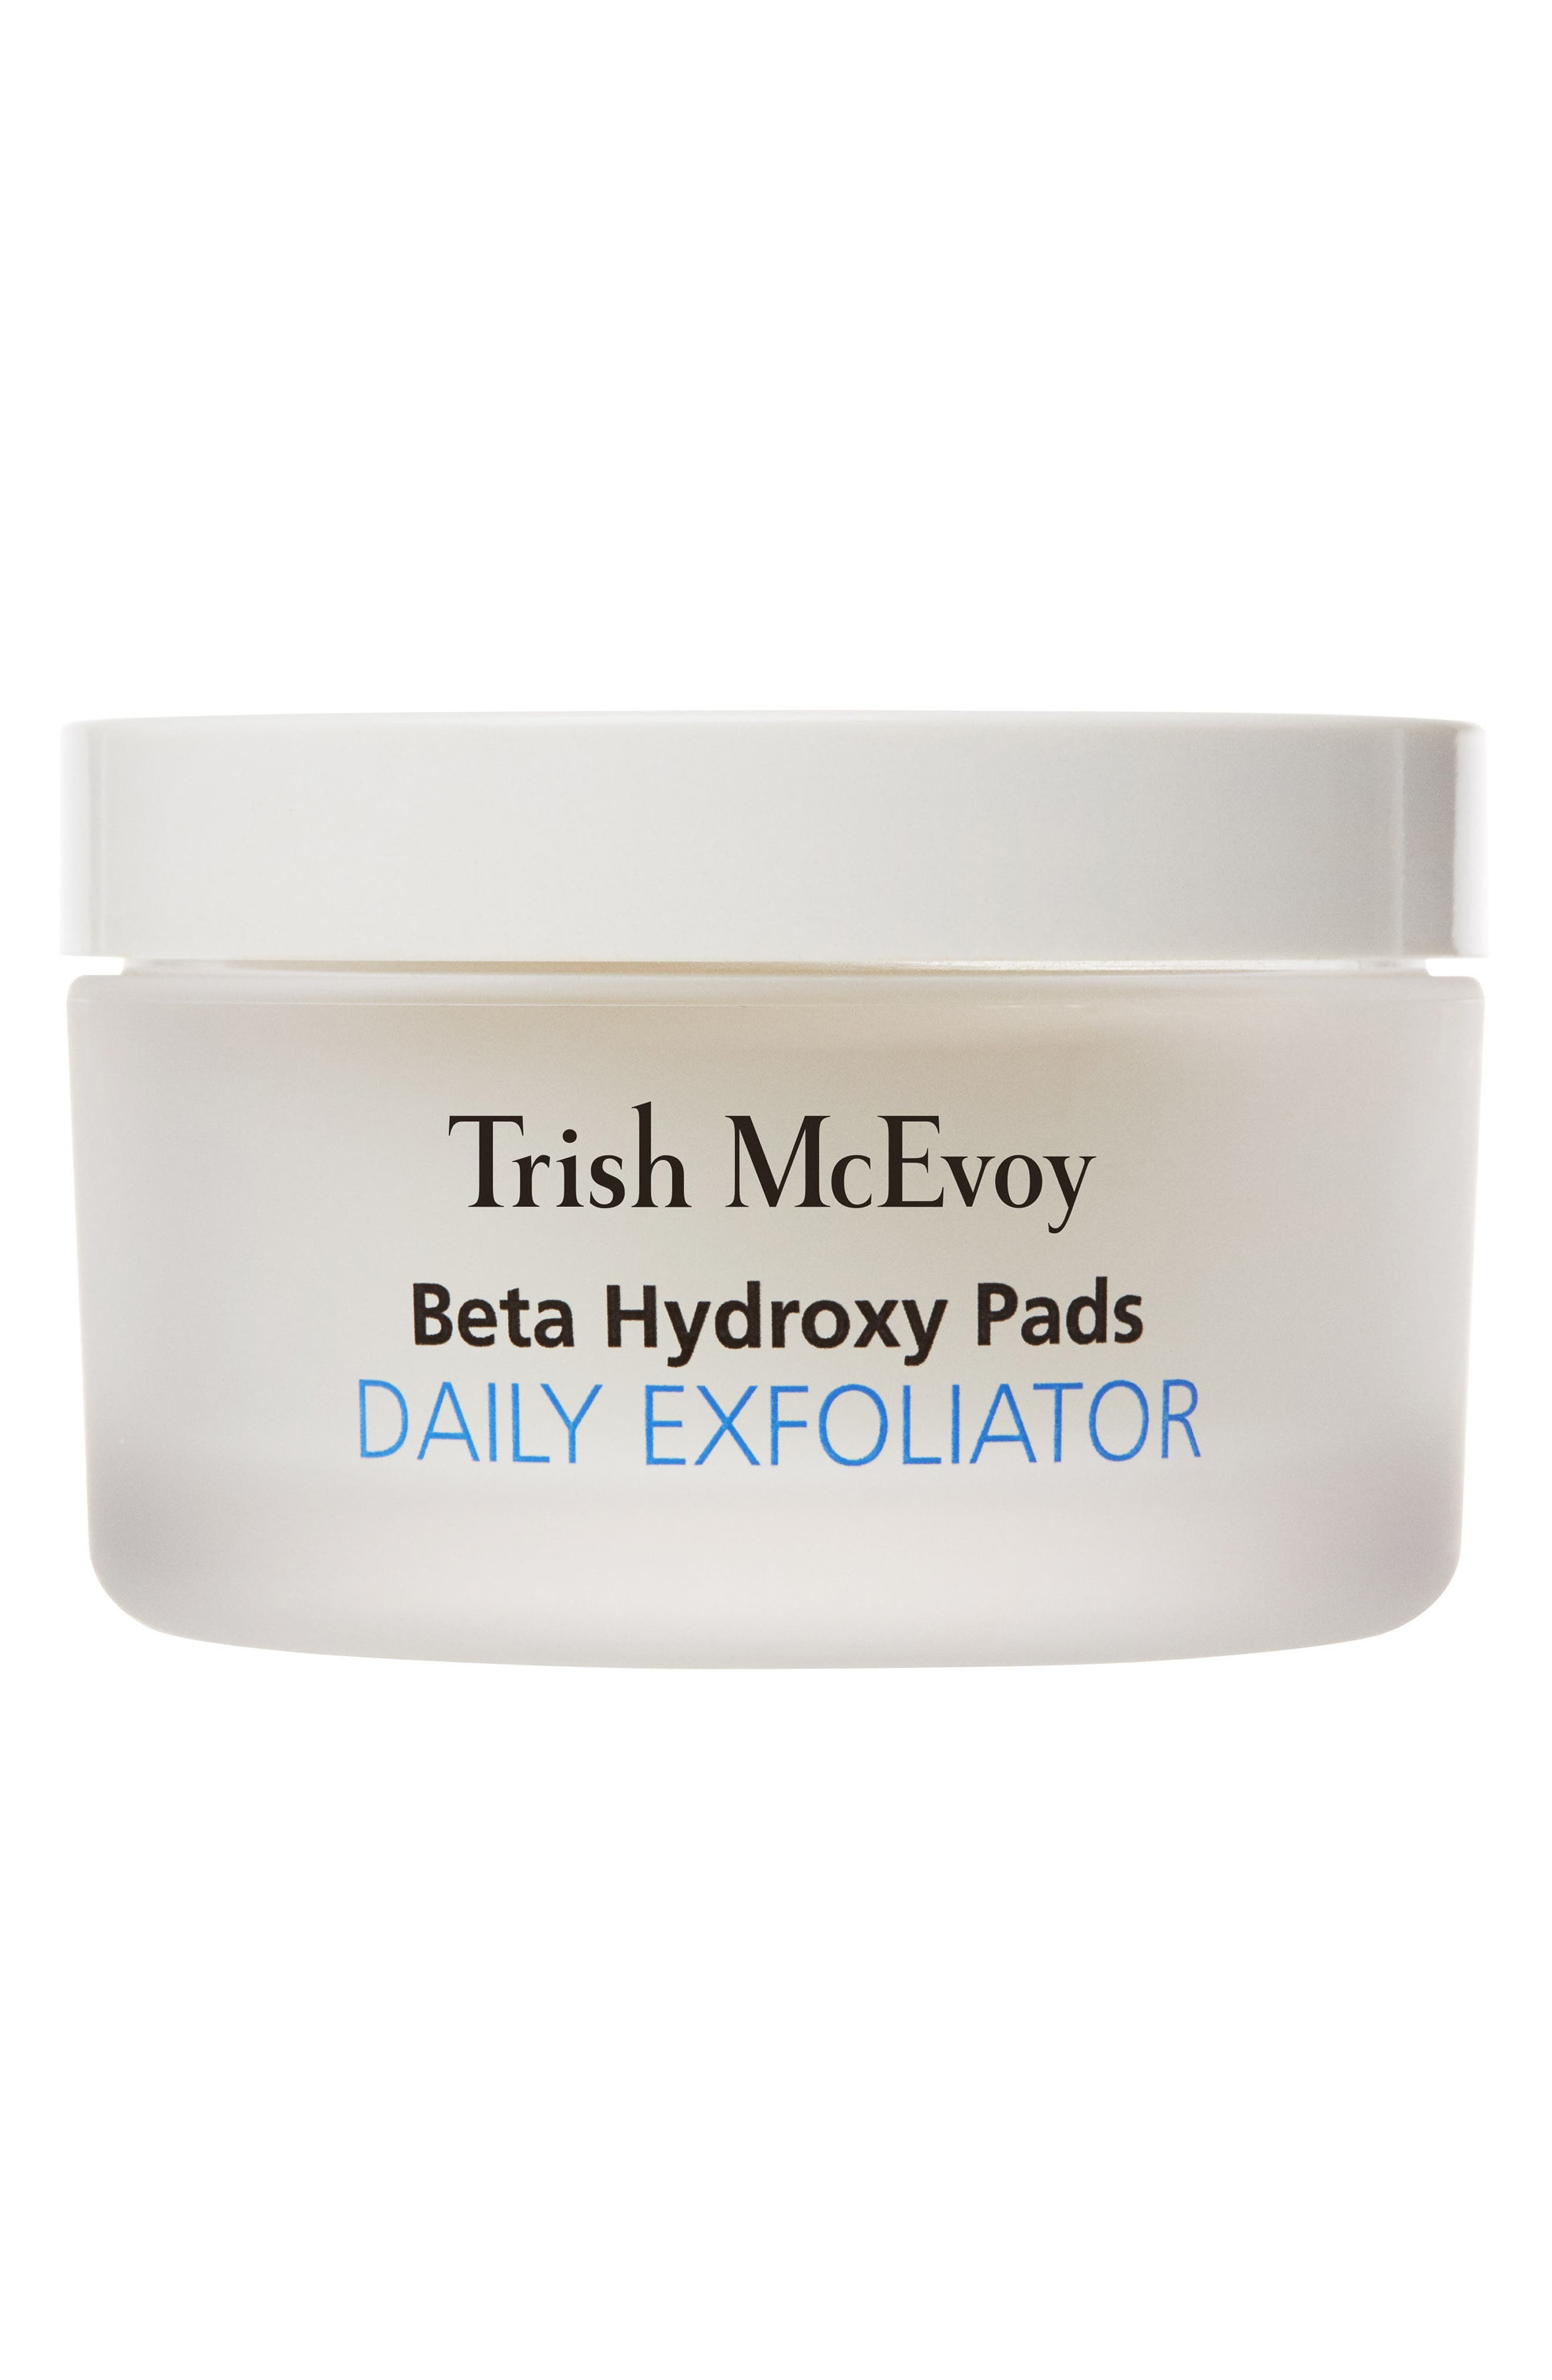 Trish McEvoy 'Even Skin' Beta Hydroxy Pads